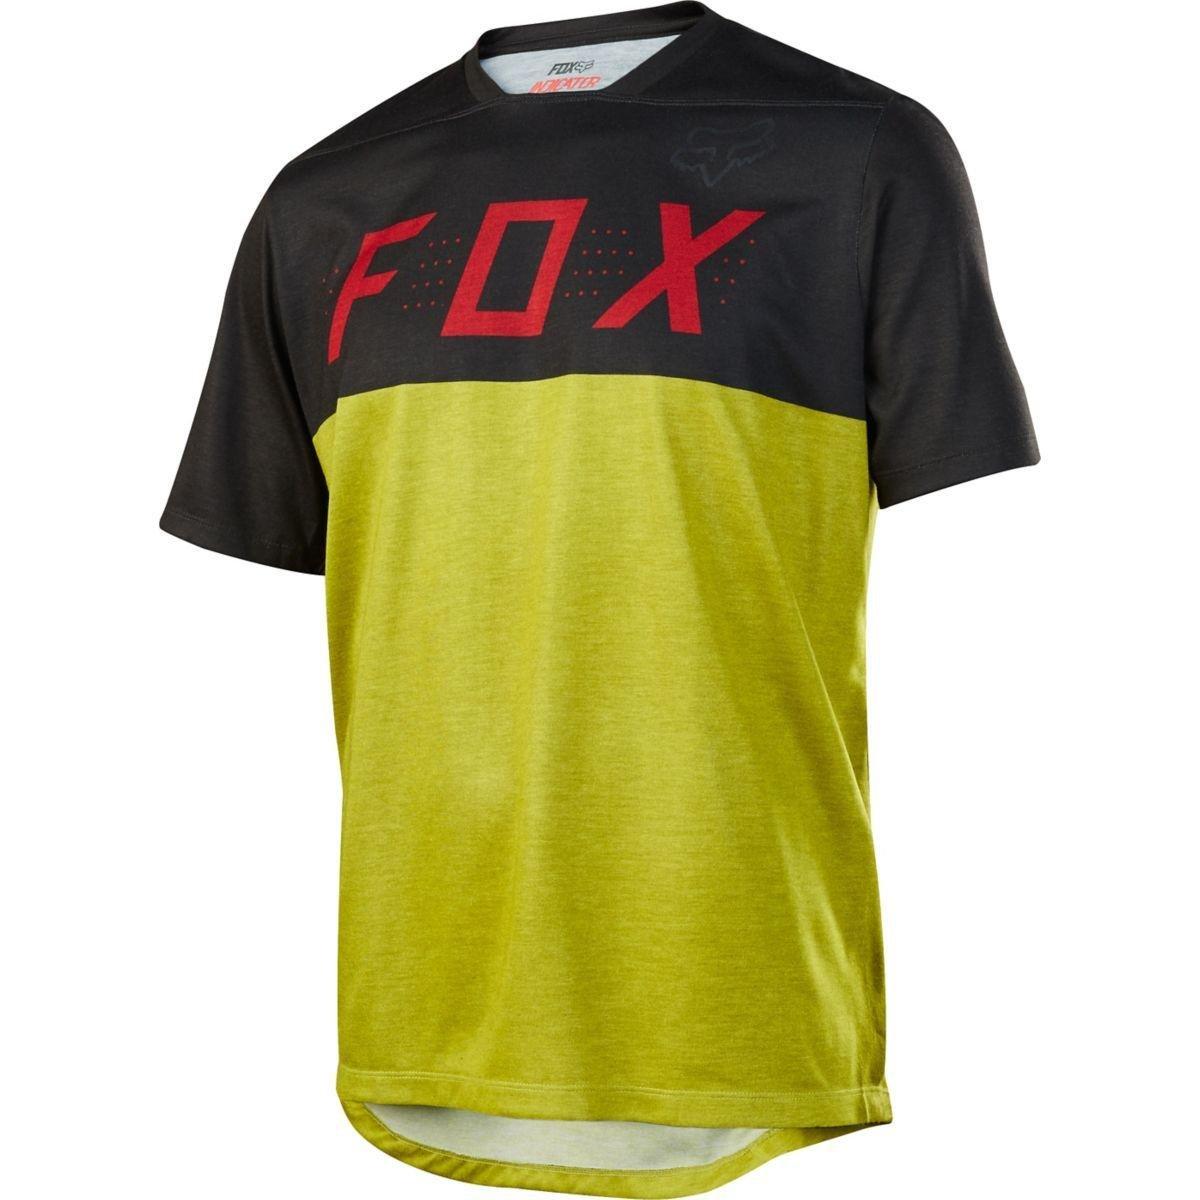 Fox Trail-Jersey Kurzarm Indicator Schwarz Gelb